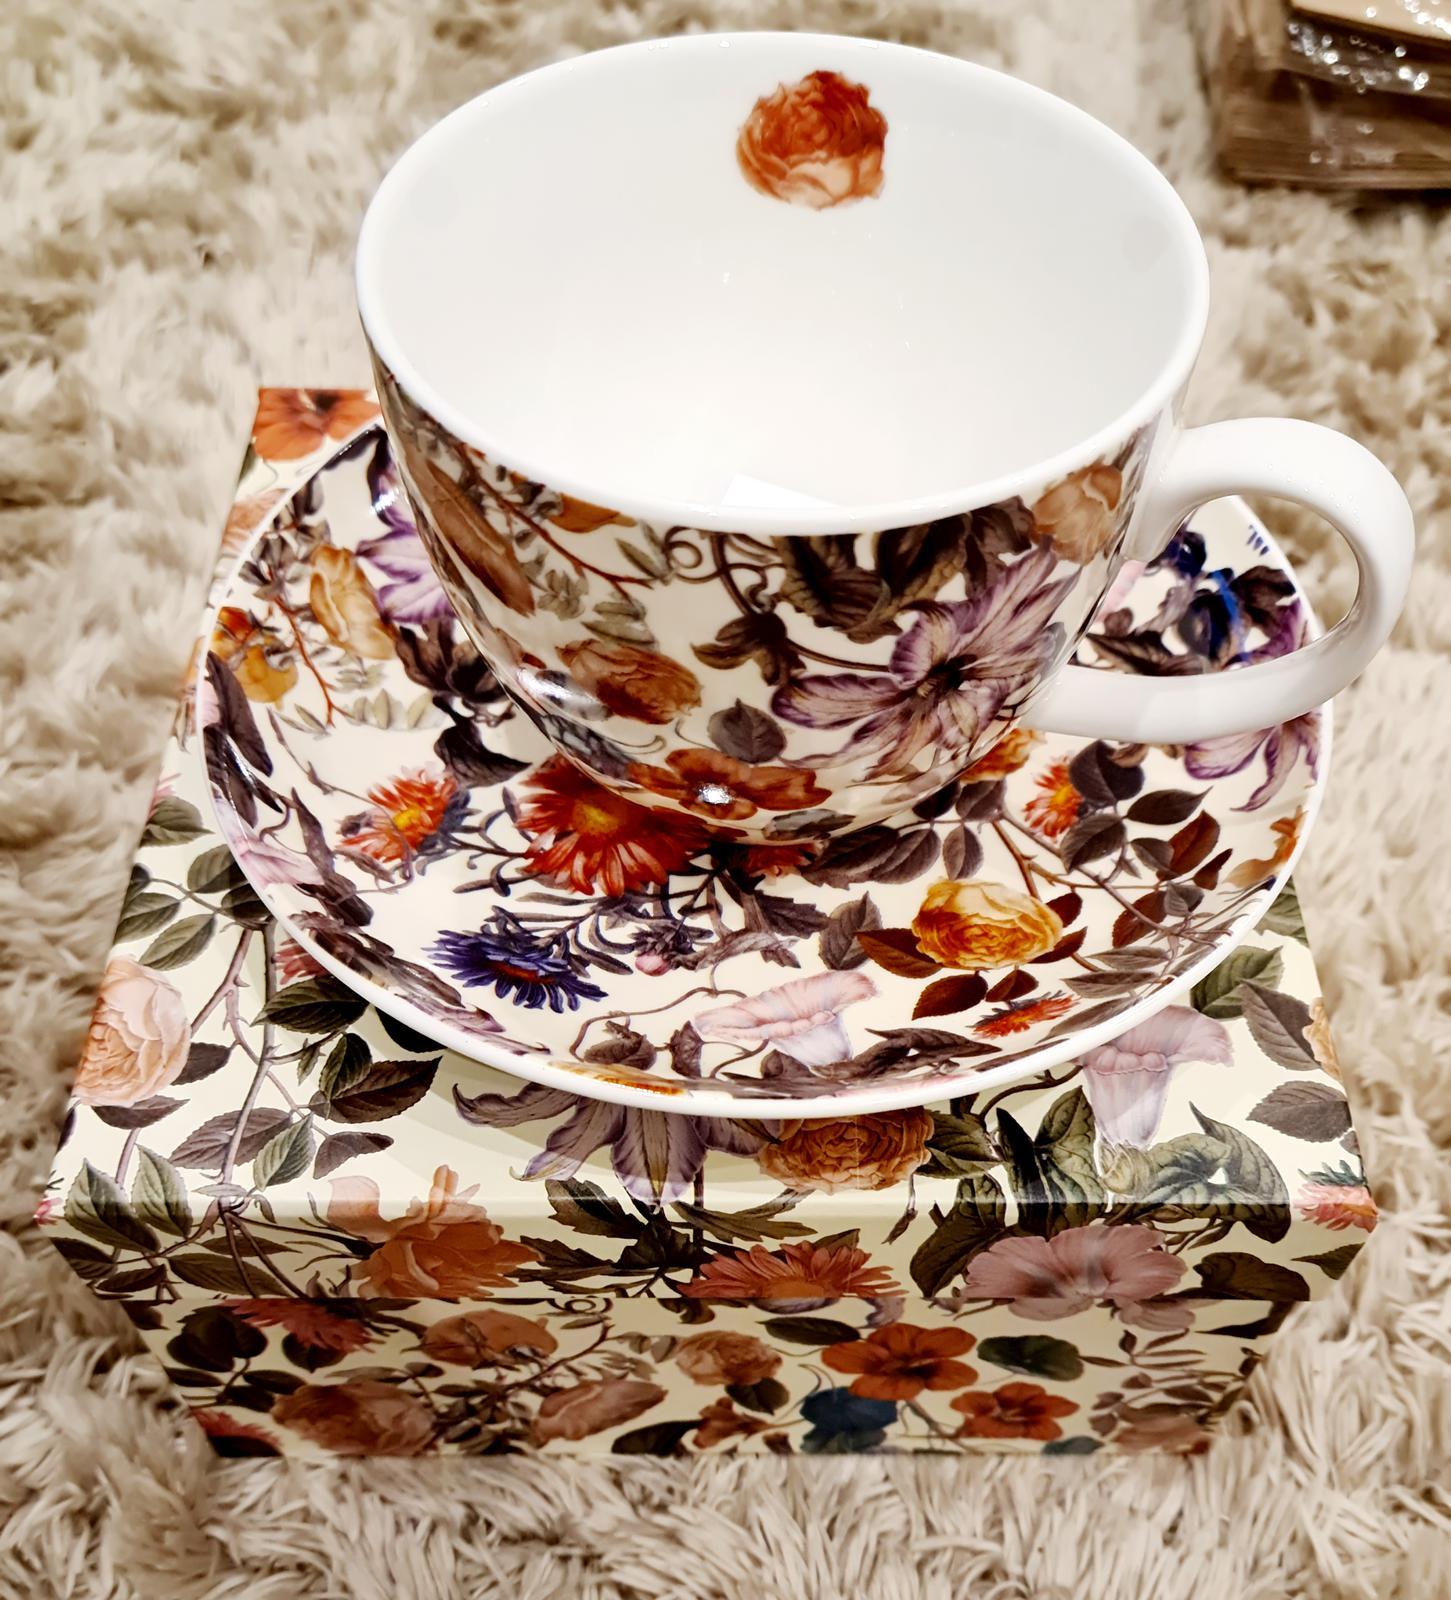 NOVÉ Porcelánové šálky na čaj s podšálkou - Obrázok č. 1